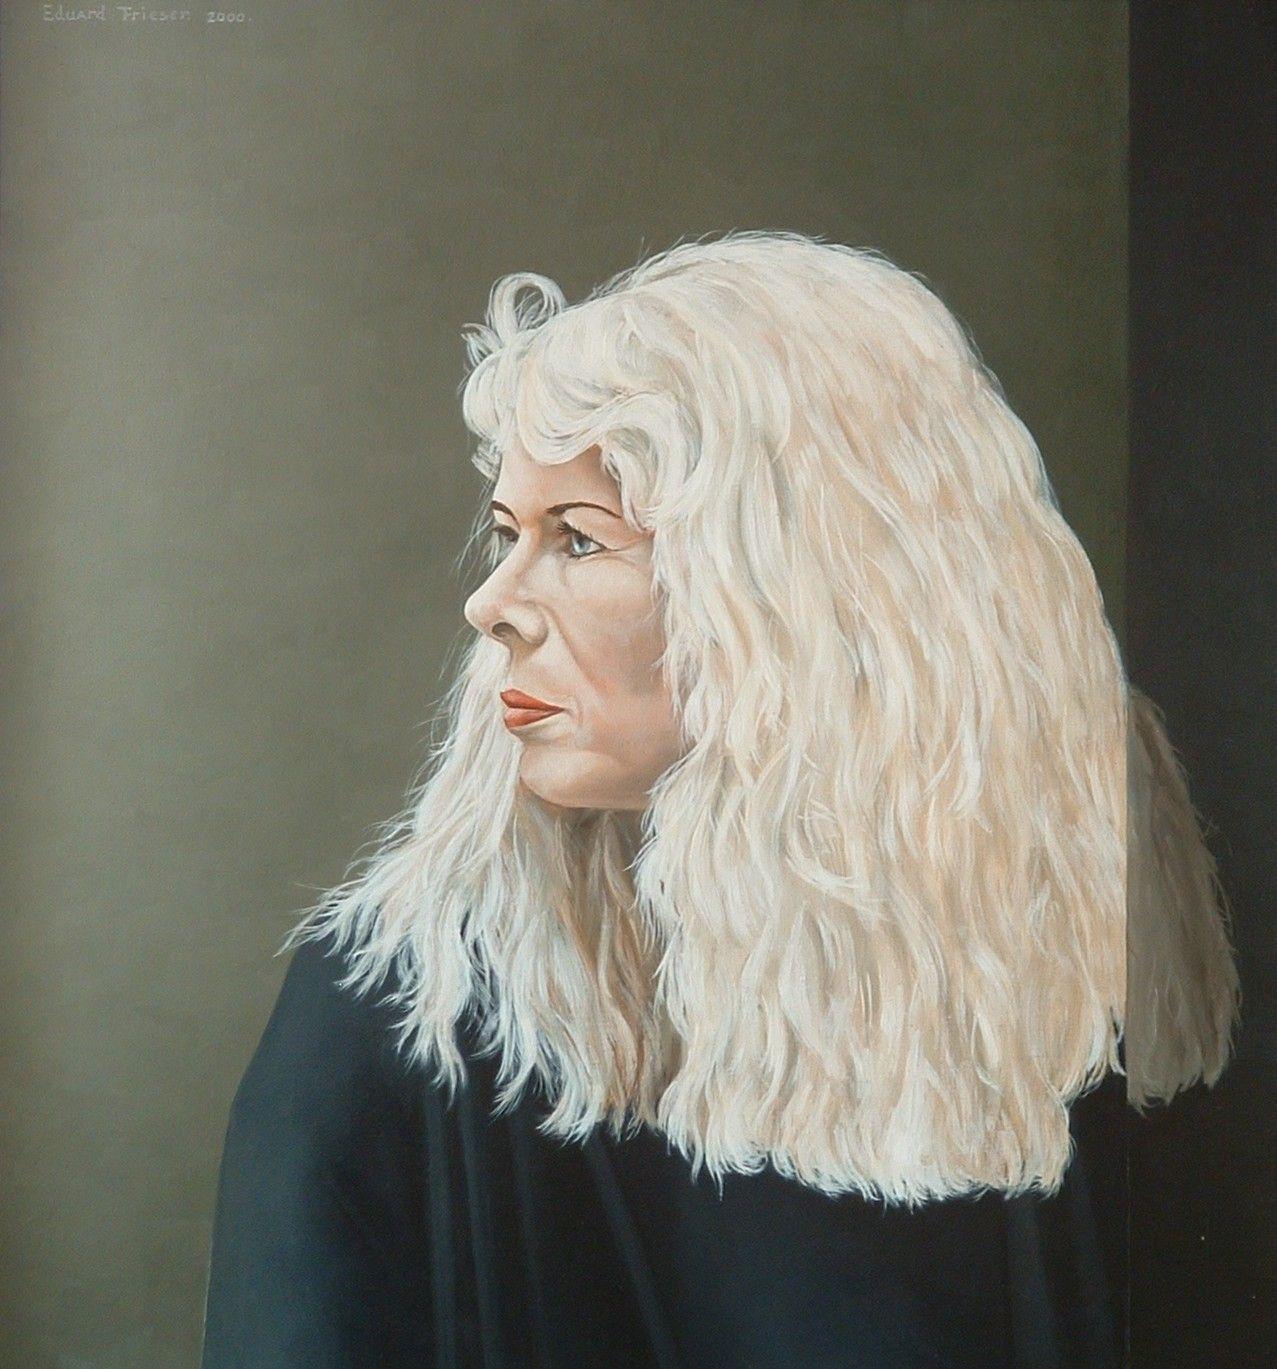 Eduard F.R. Frieser. Beitste, mijn vrouw. Portret